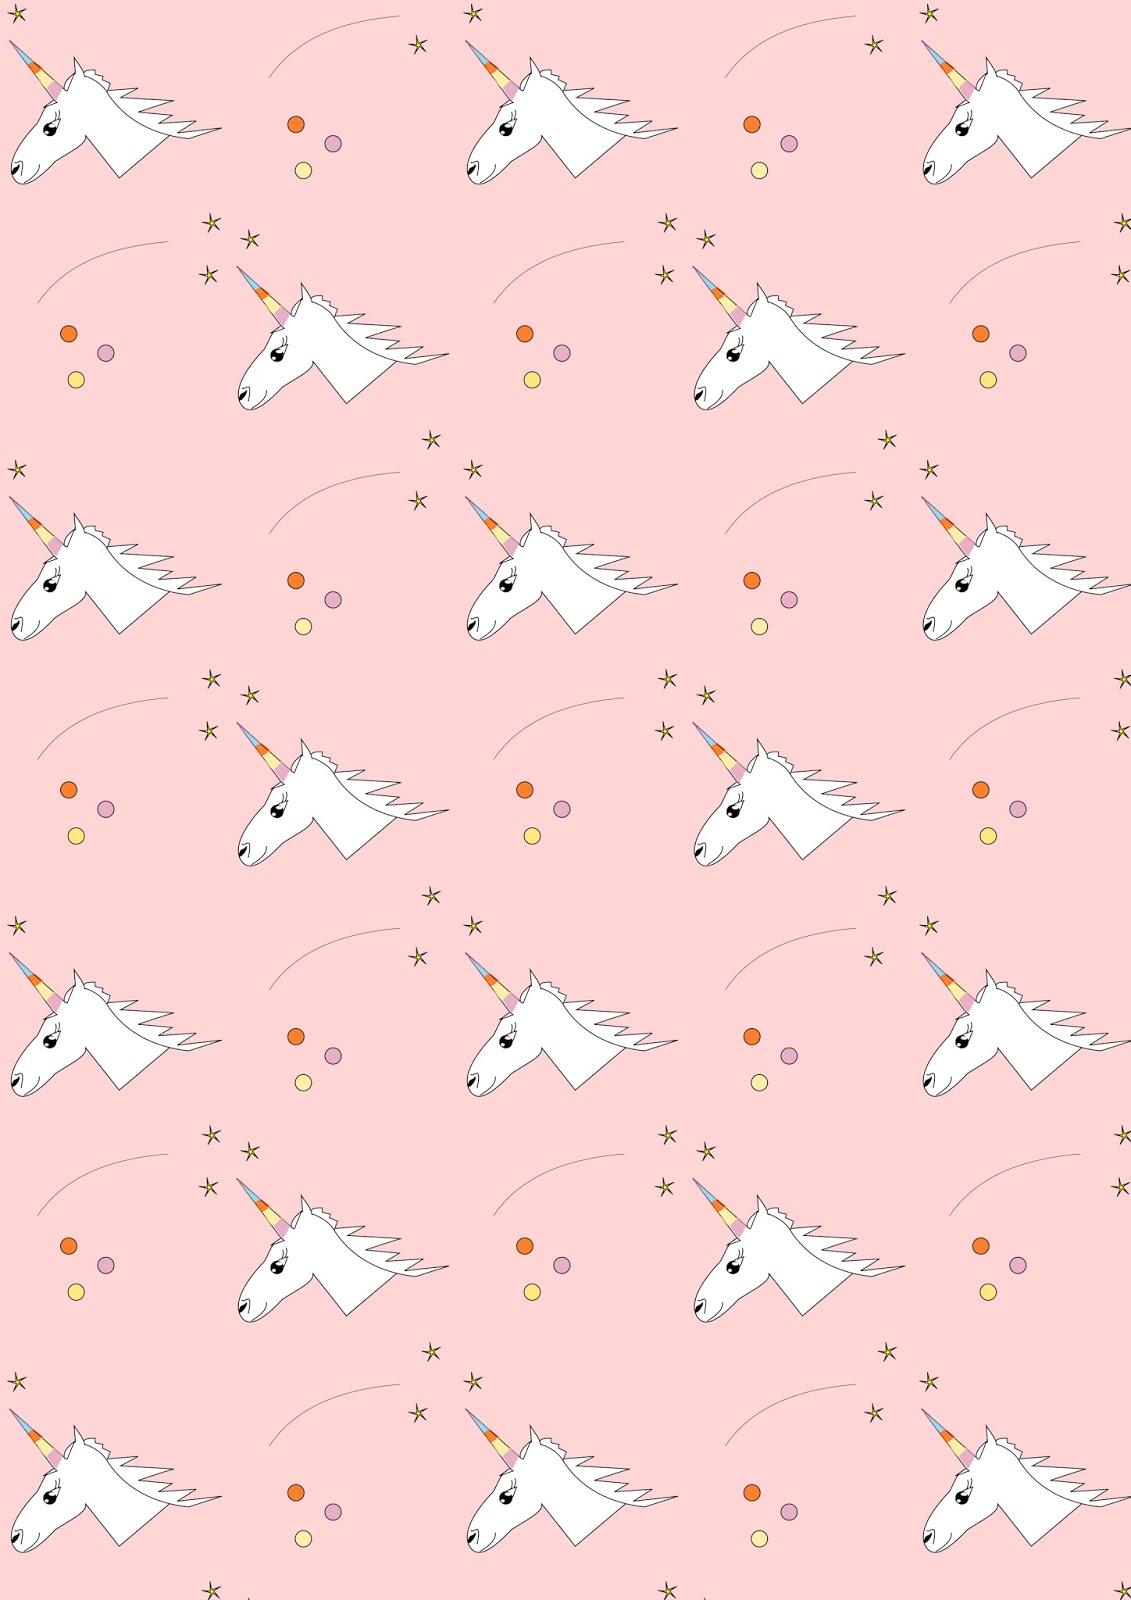 Free digital unicorn scrapbooking paper ausdruckbares for Cute paper designs